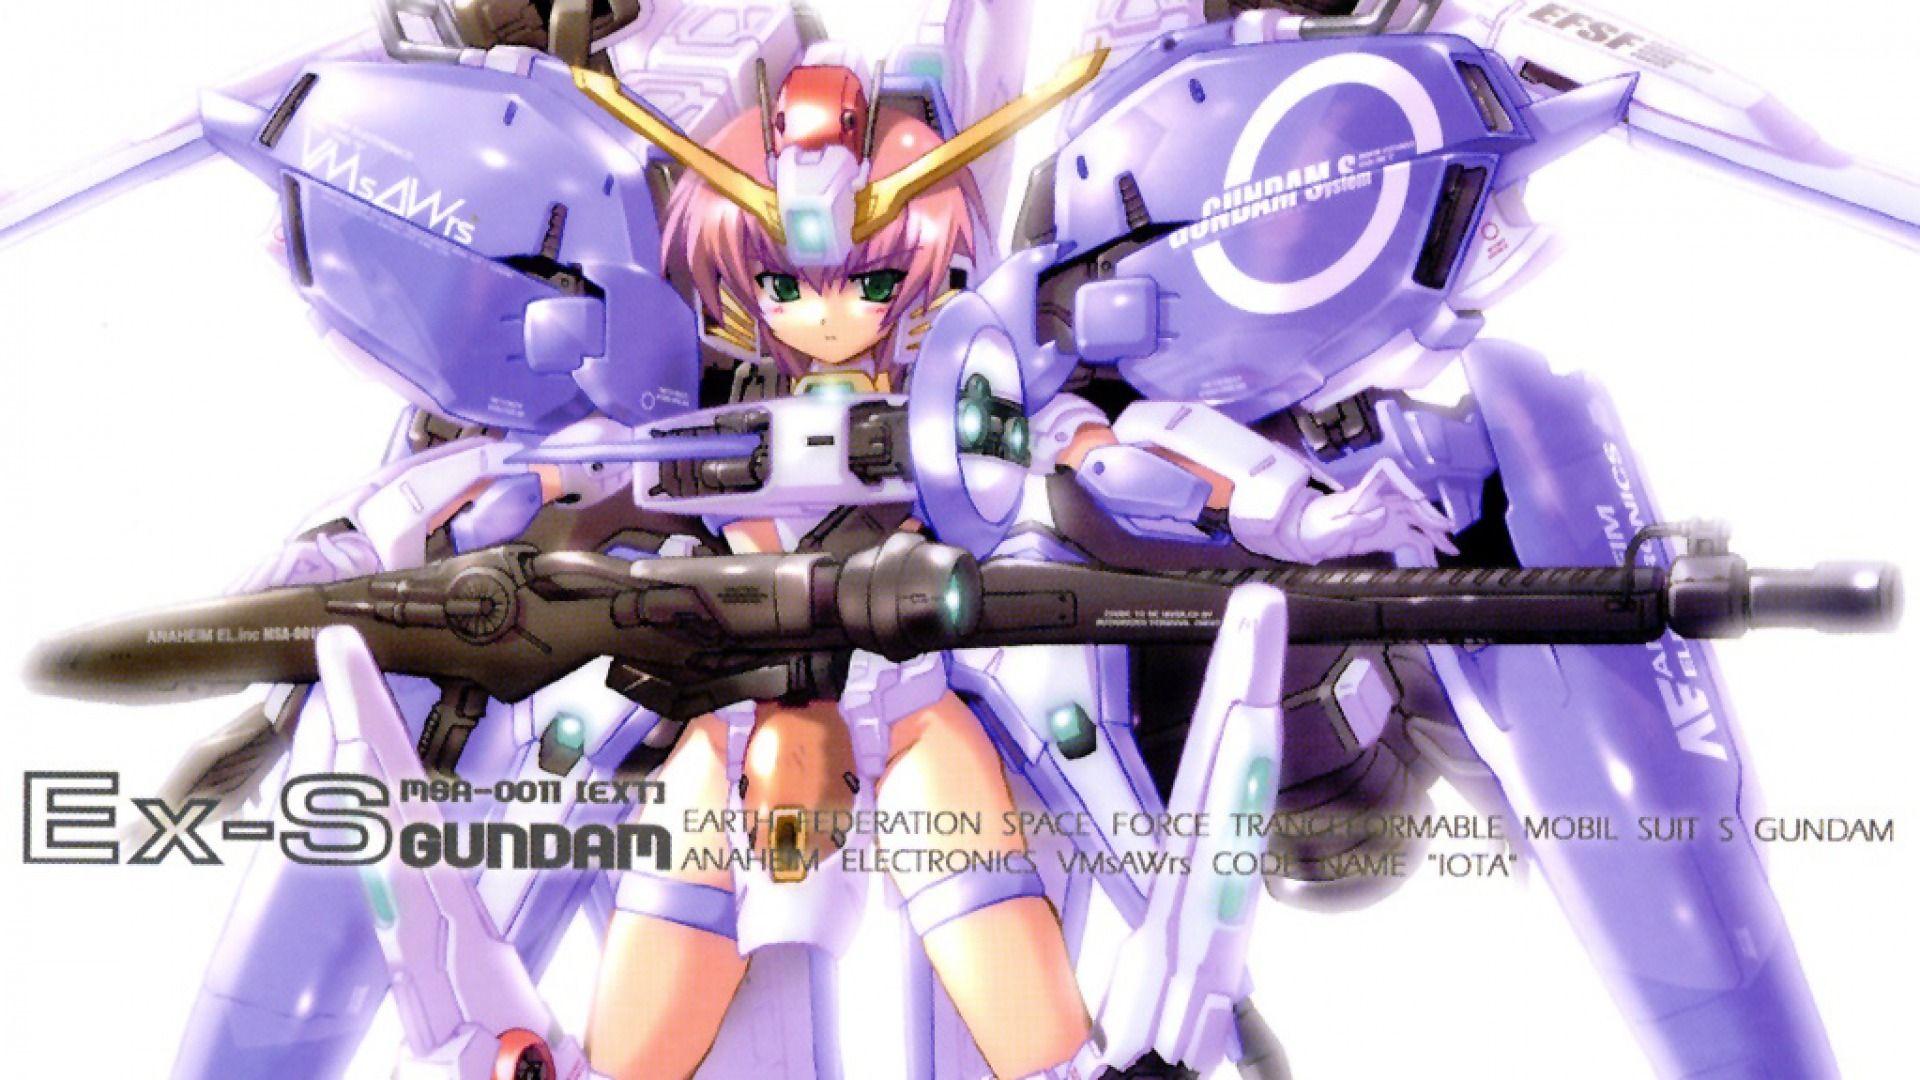 Ex S Gundam Moe Gundam Wallpapers Gundam Custom Gundam